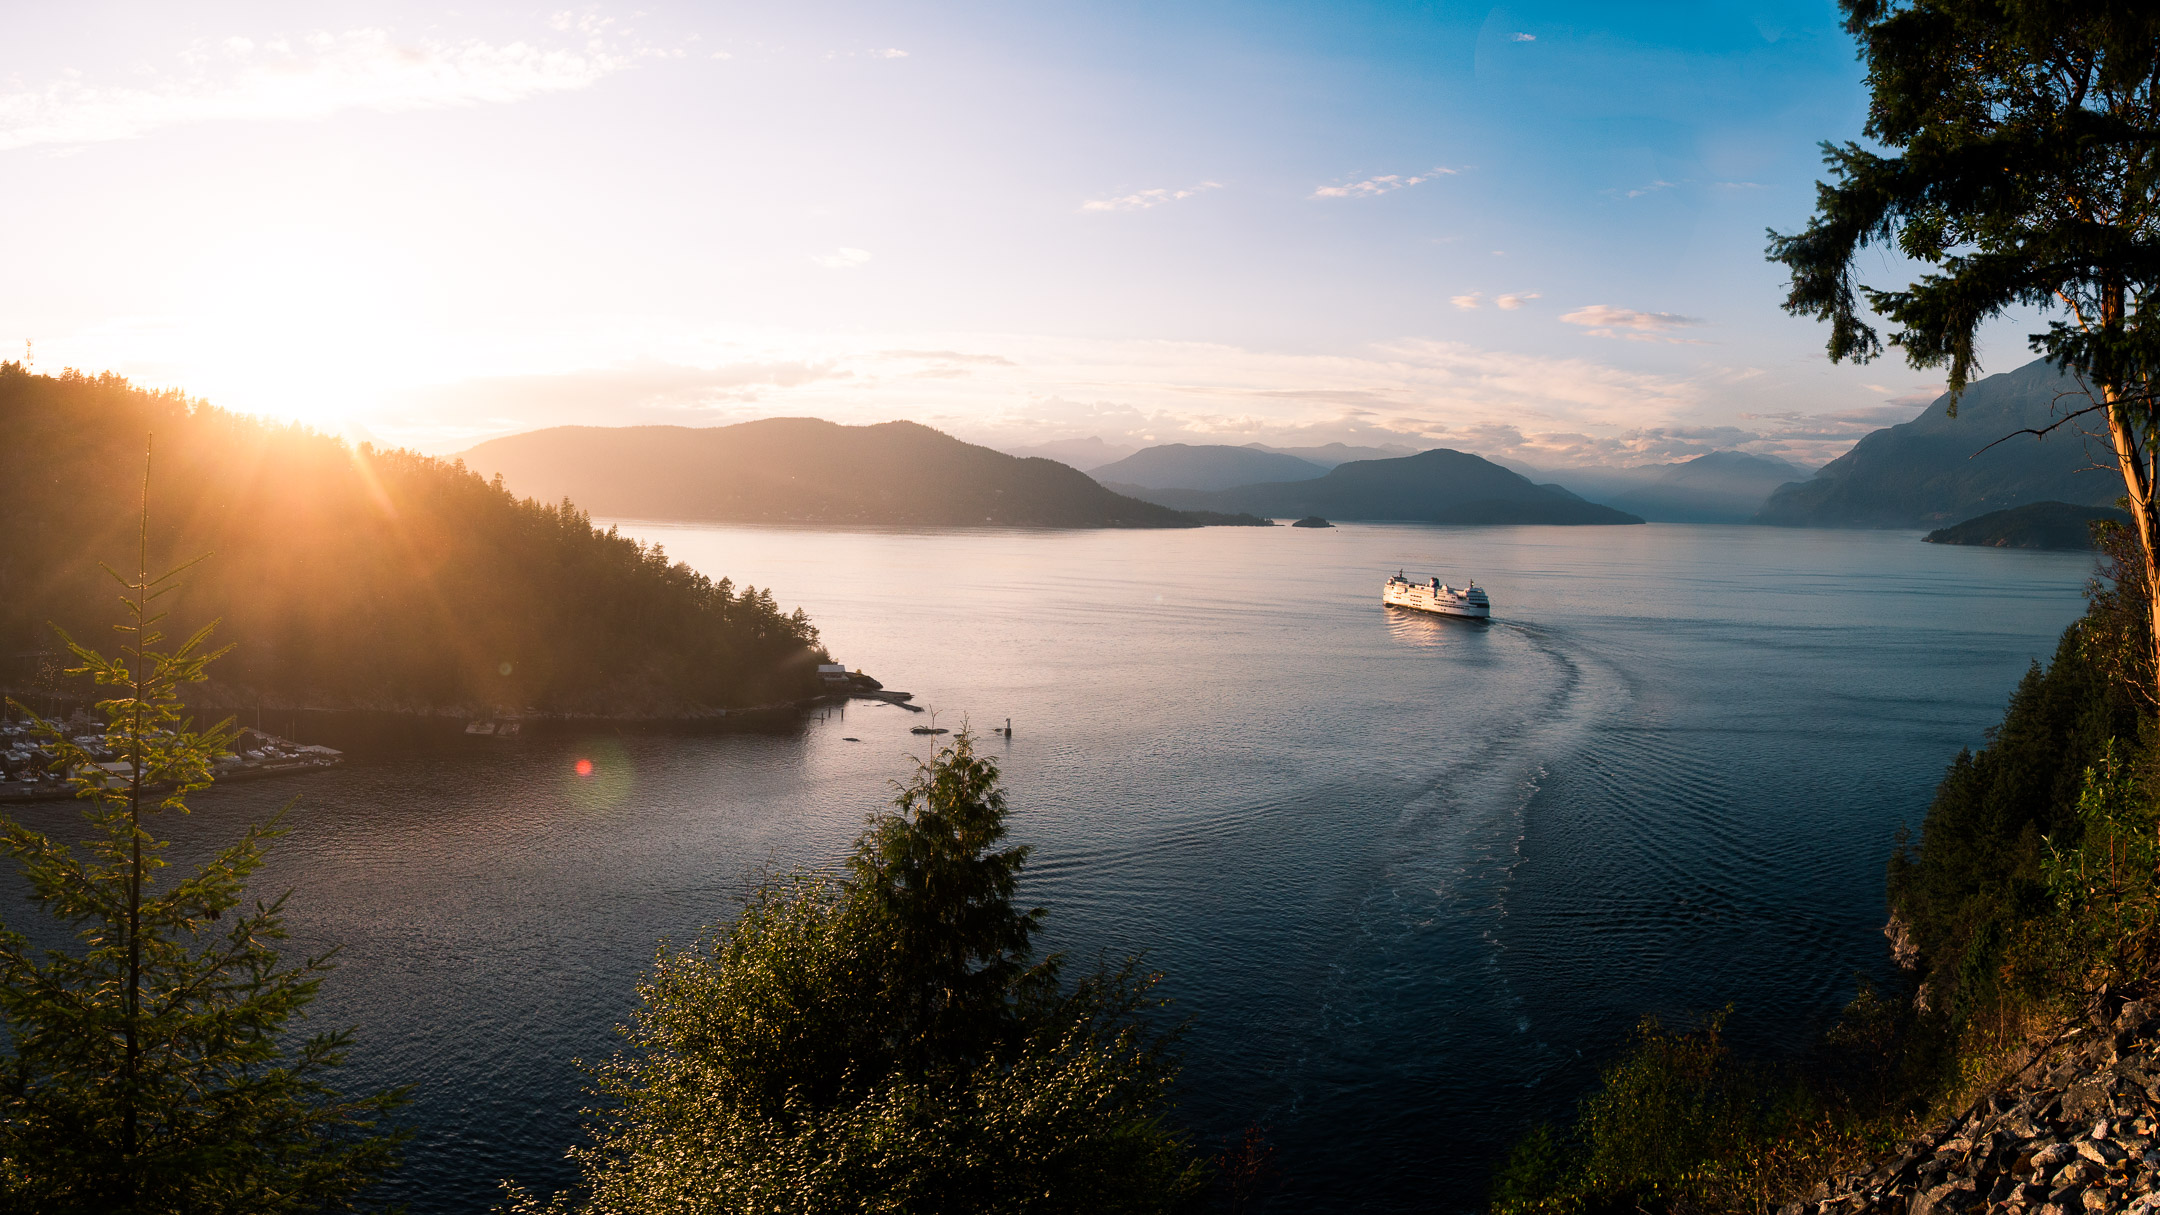 BC Ferries West Coast Sunset